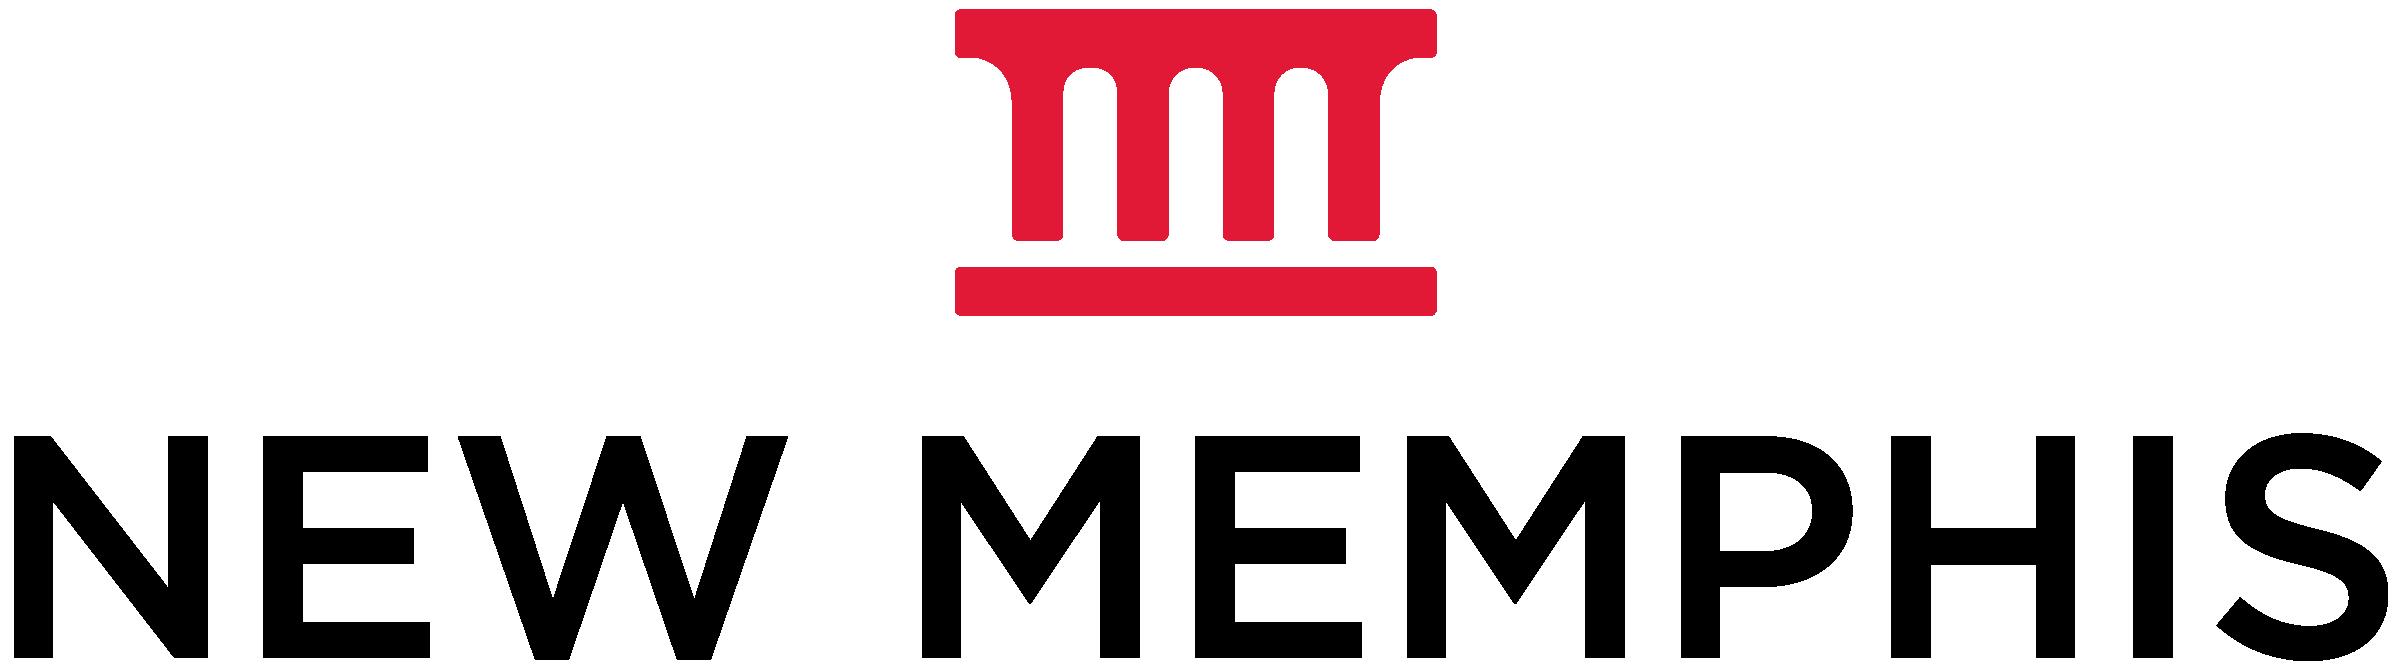 NewMem_Color_2017_large2.png